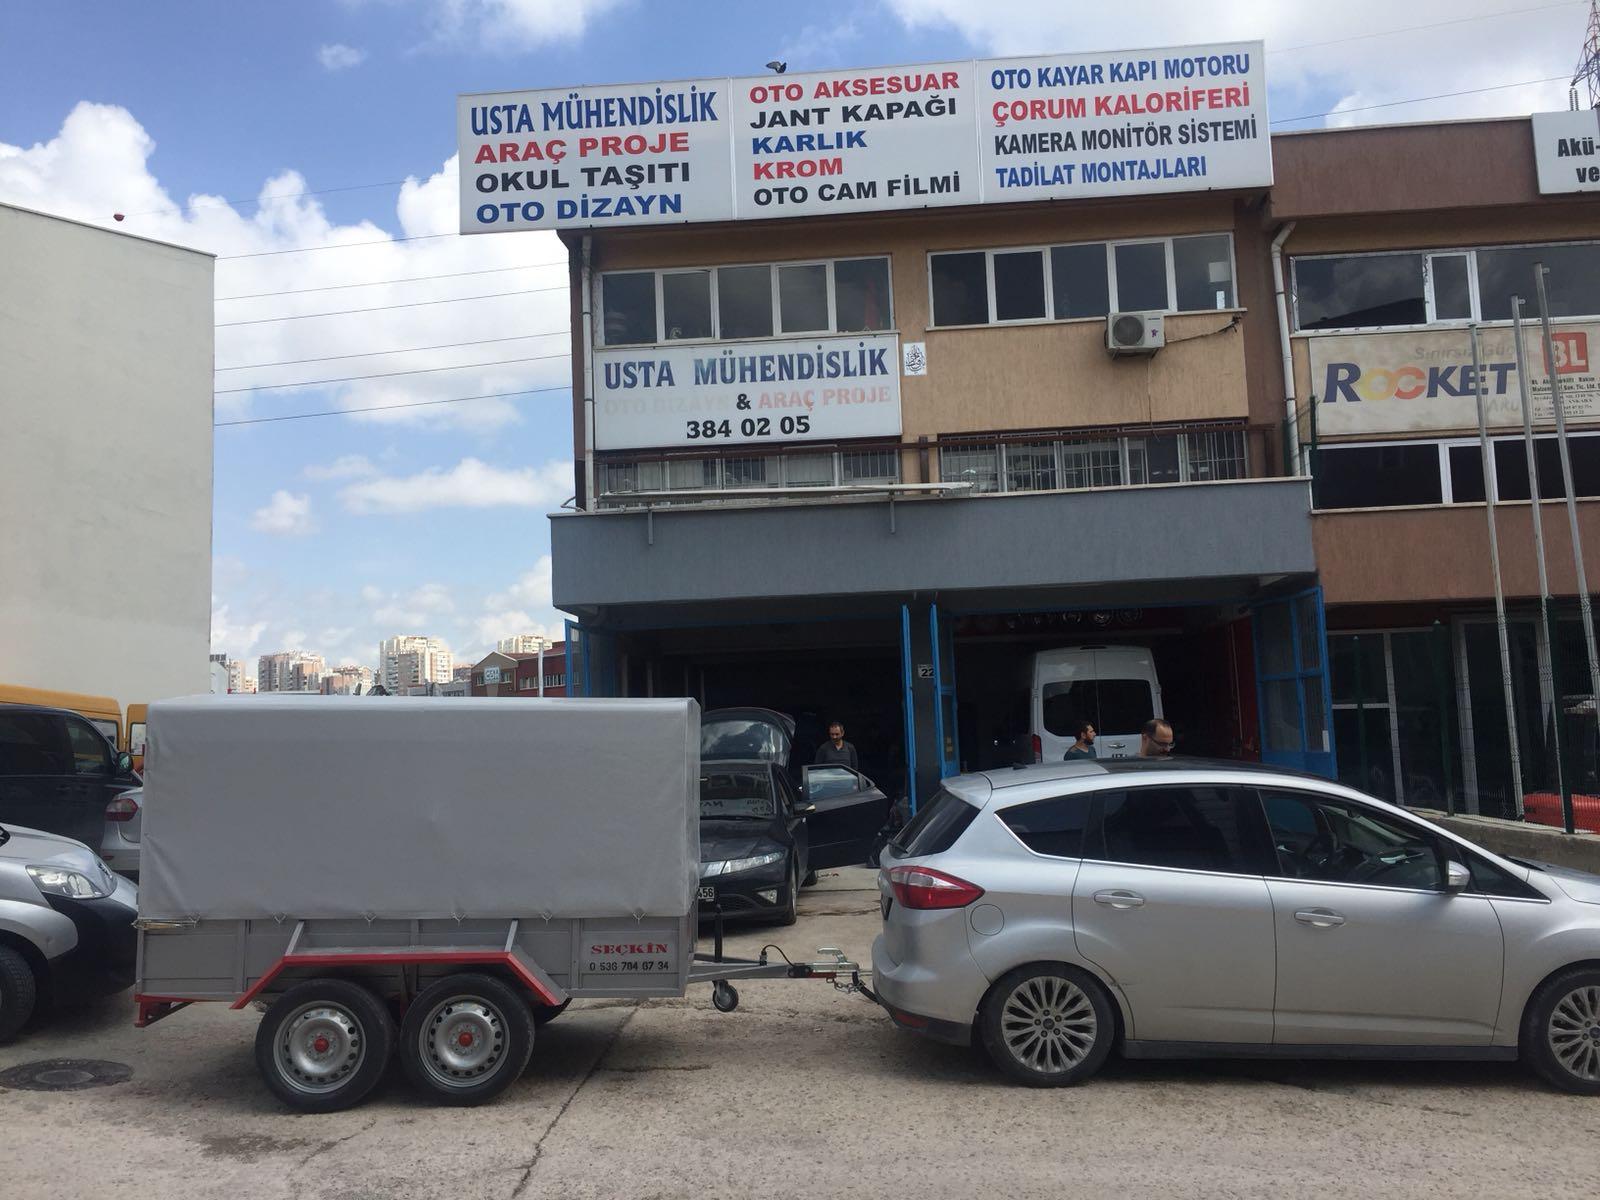 ÇEKİ DEMİRİ+ARAÇ PROJE+ÇEKİ DEMİRİ TAKMA MONTAJI ANKARA 024